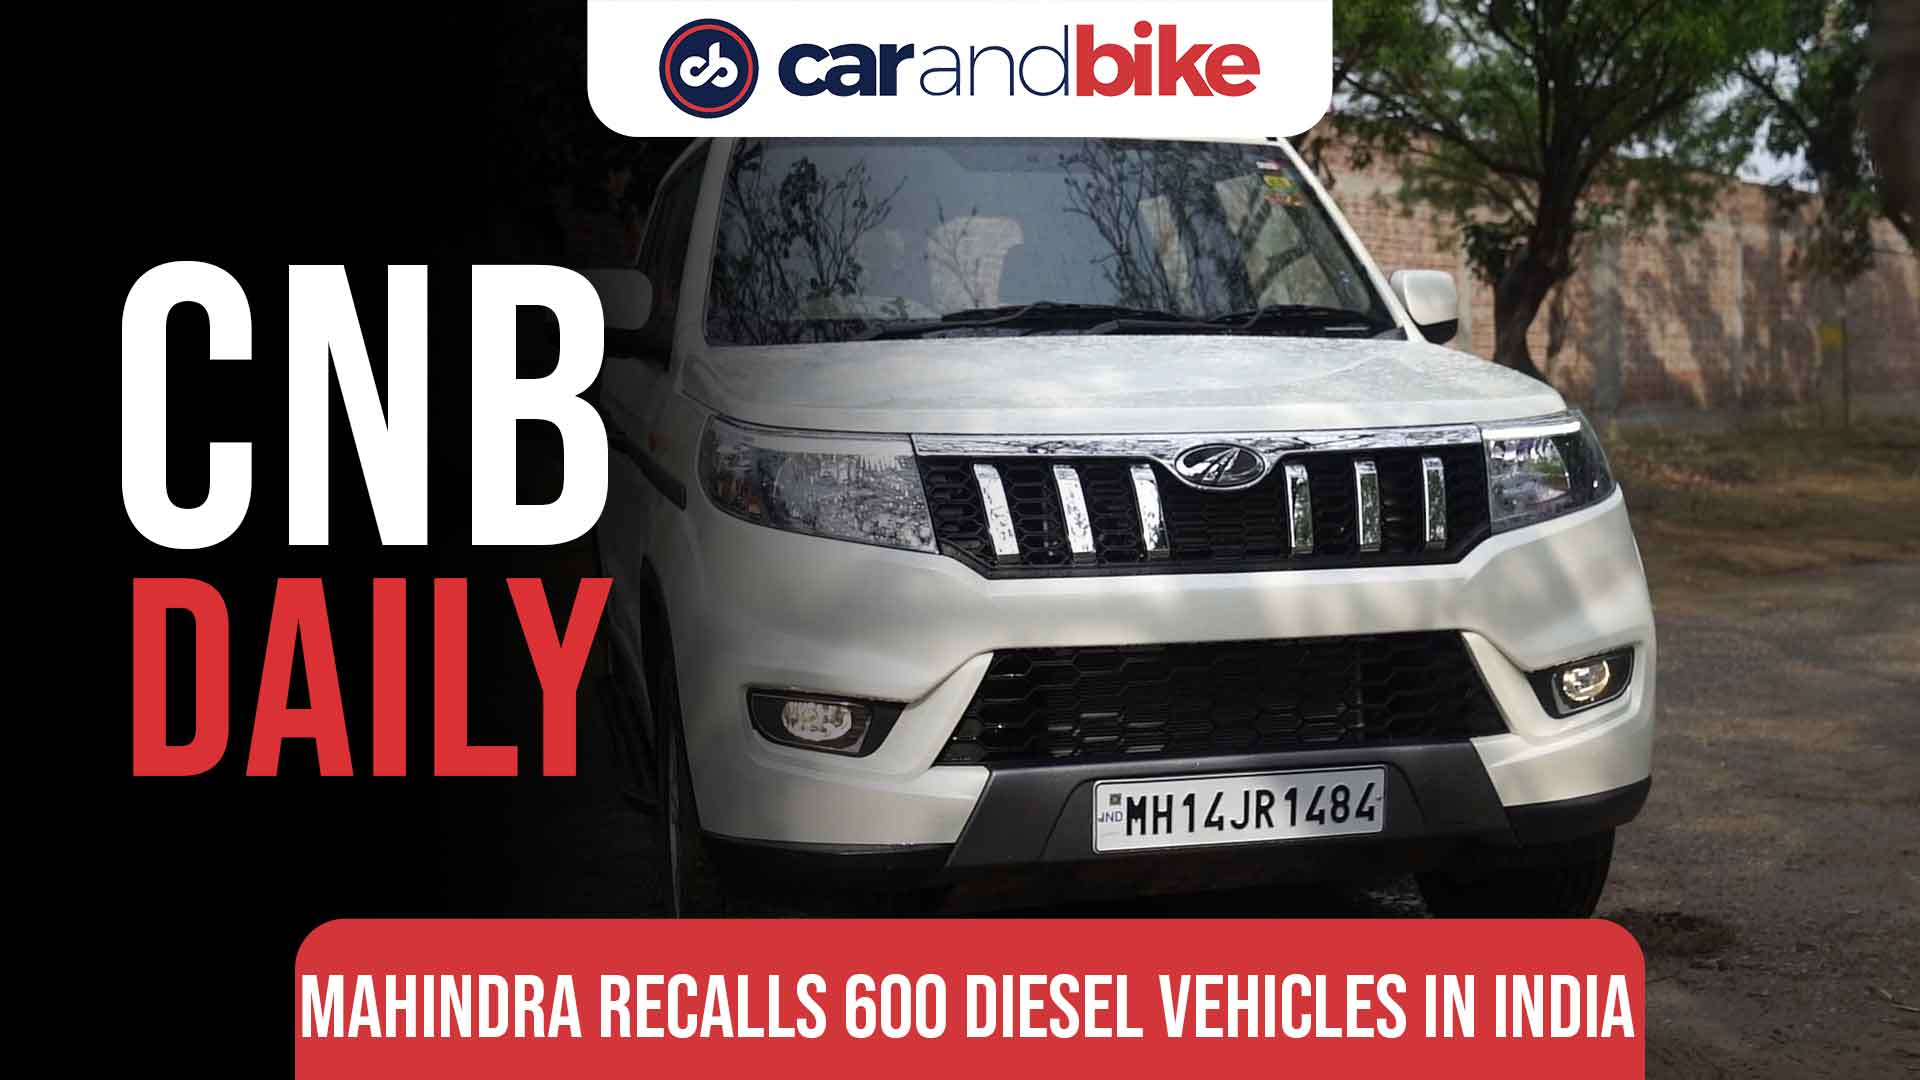 Mahindra recalls 600 diesel vehicles in India